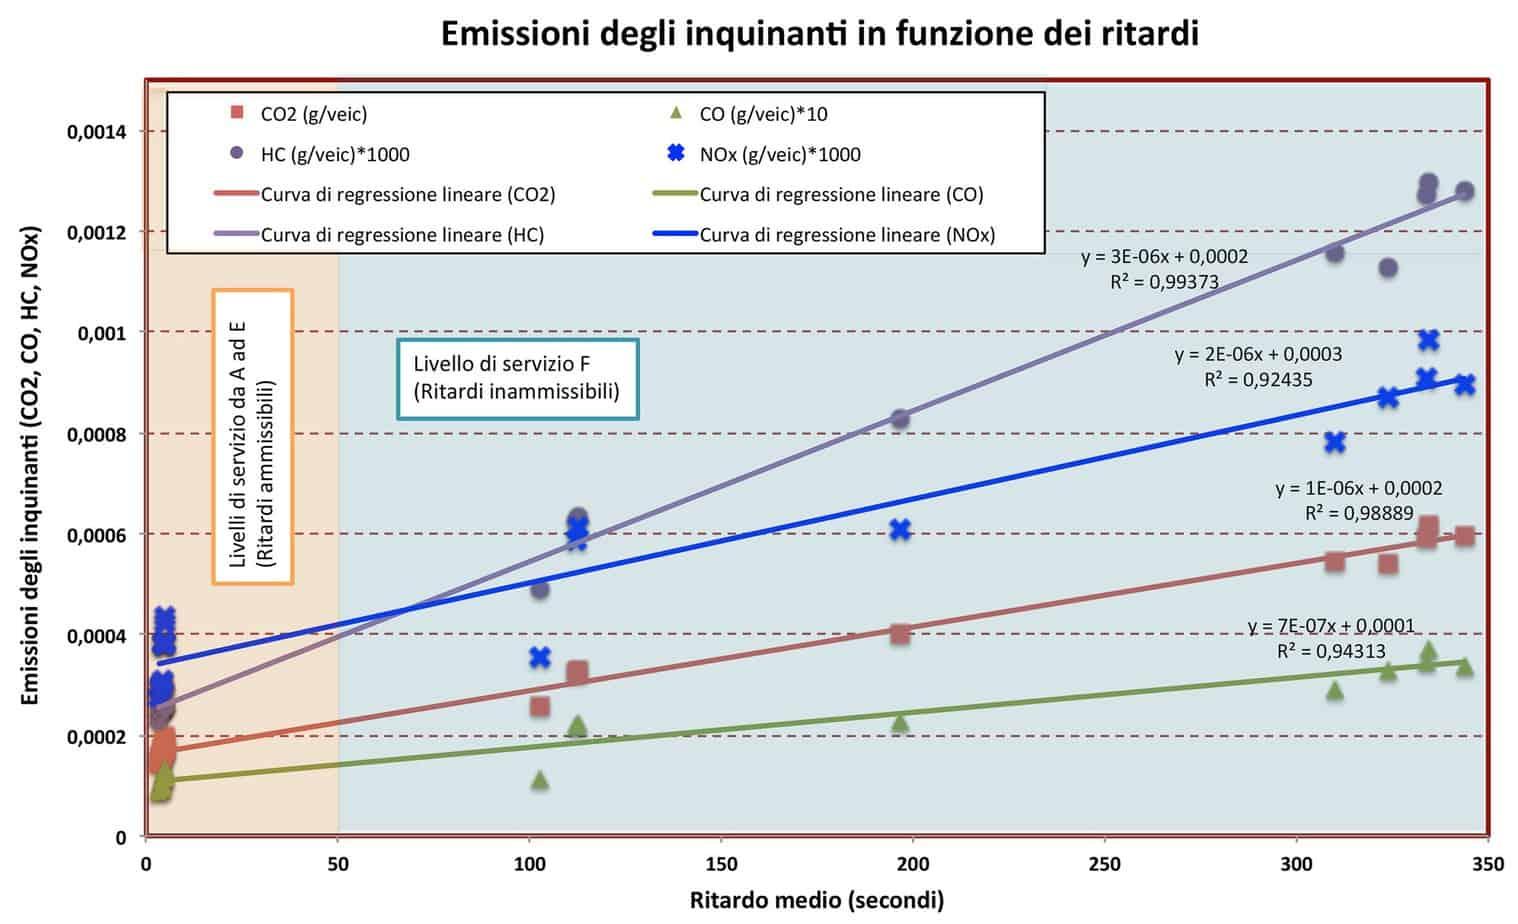 Le emissioni di inquinanti in funzione dei ritardi